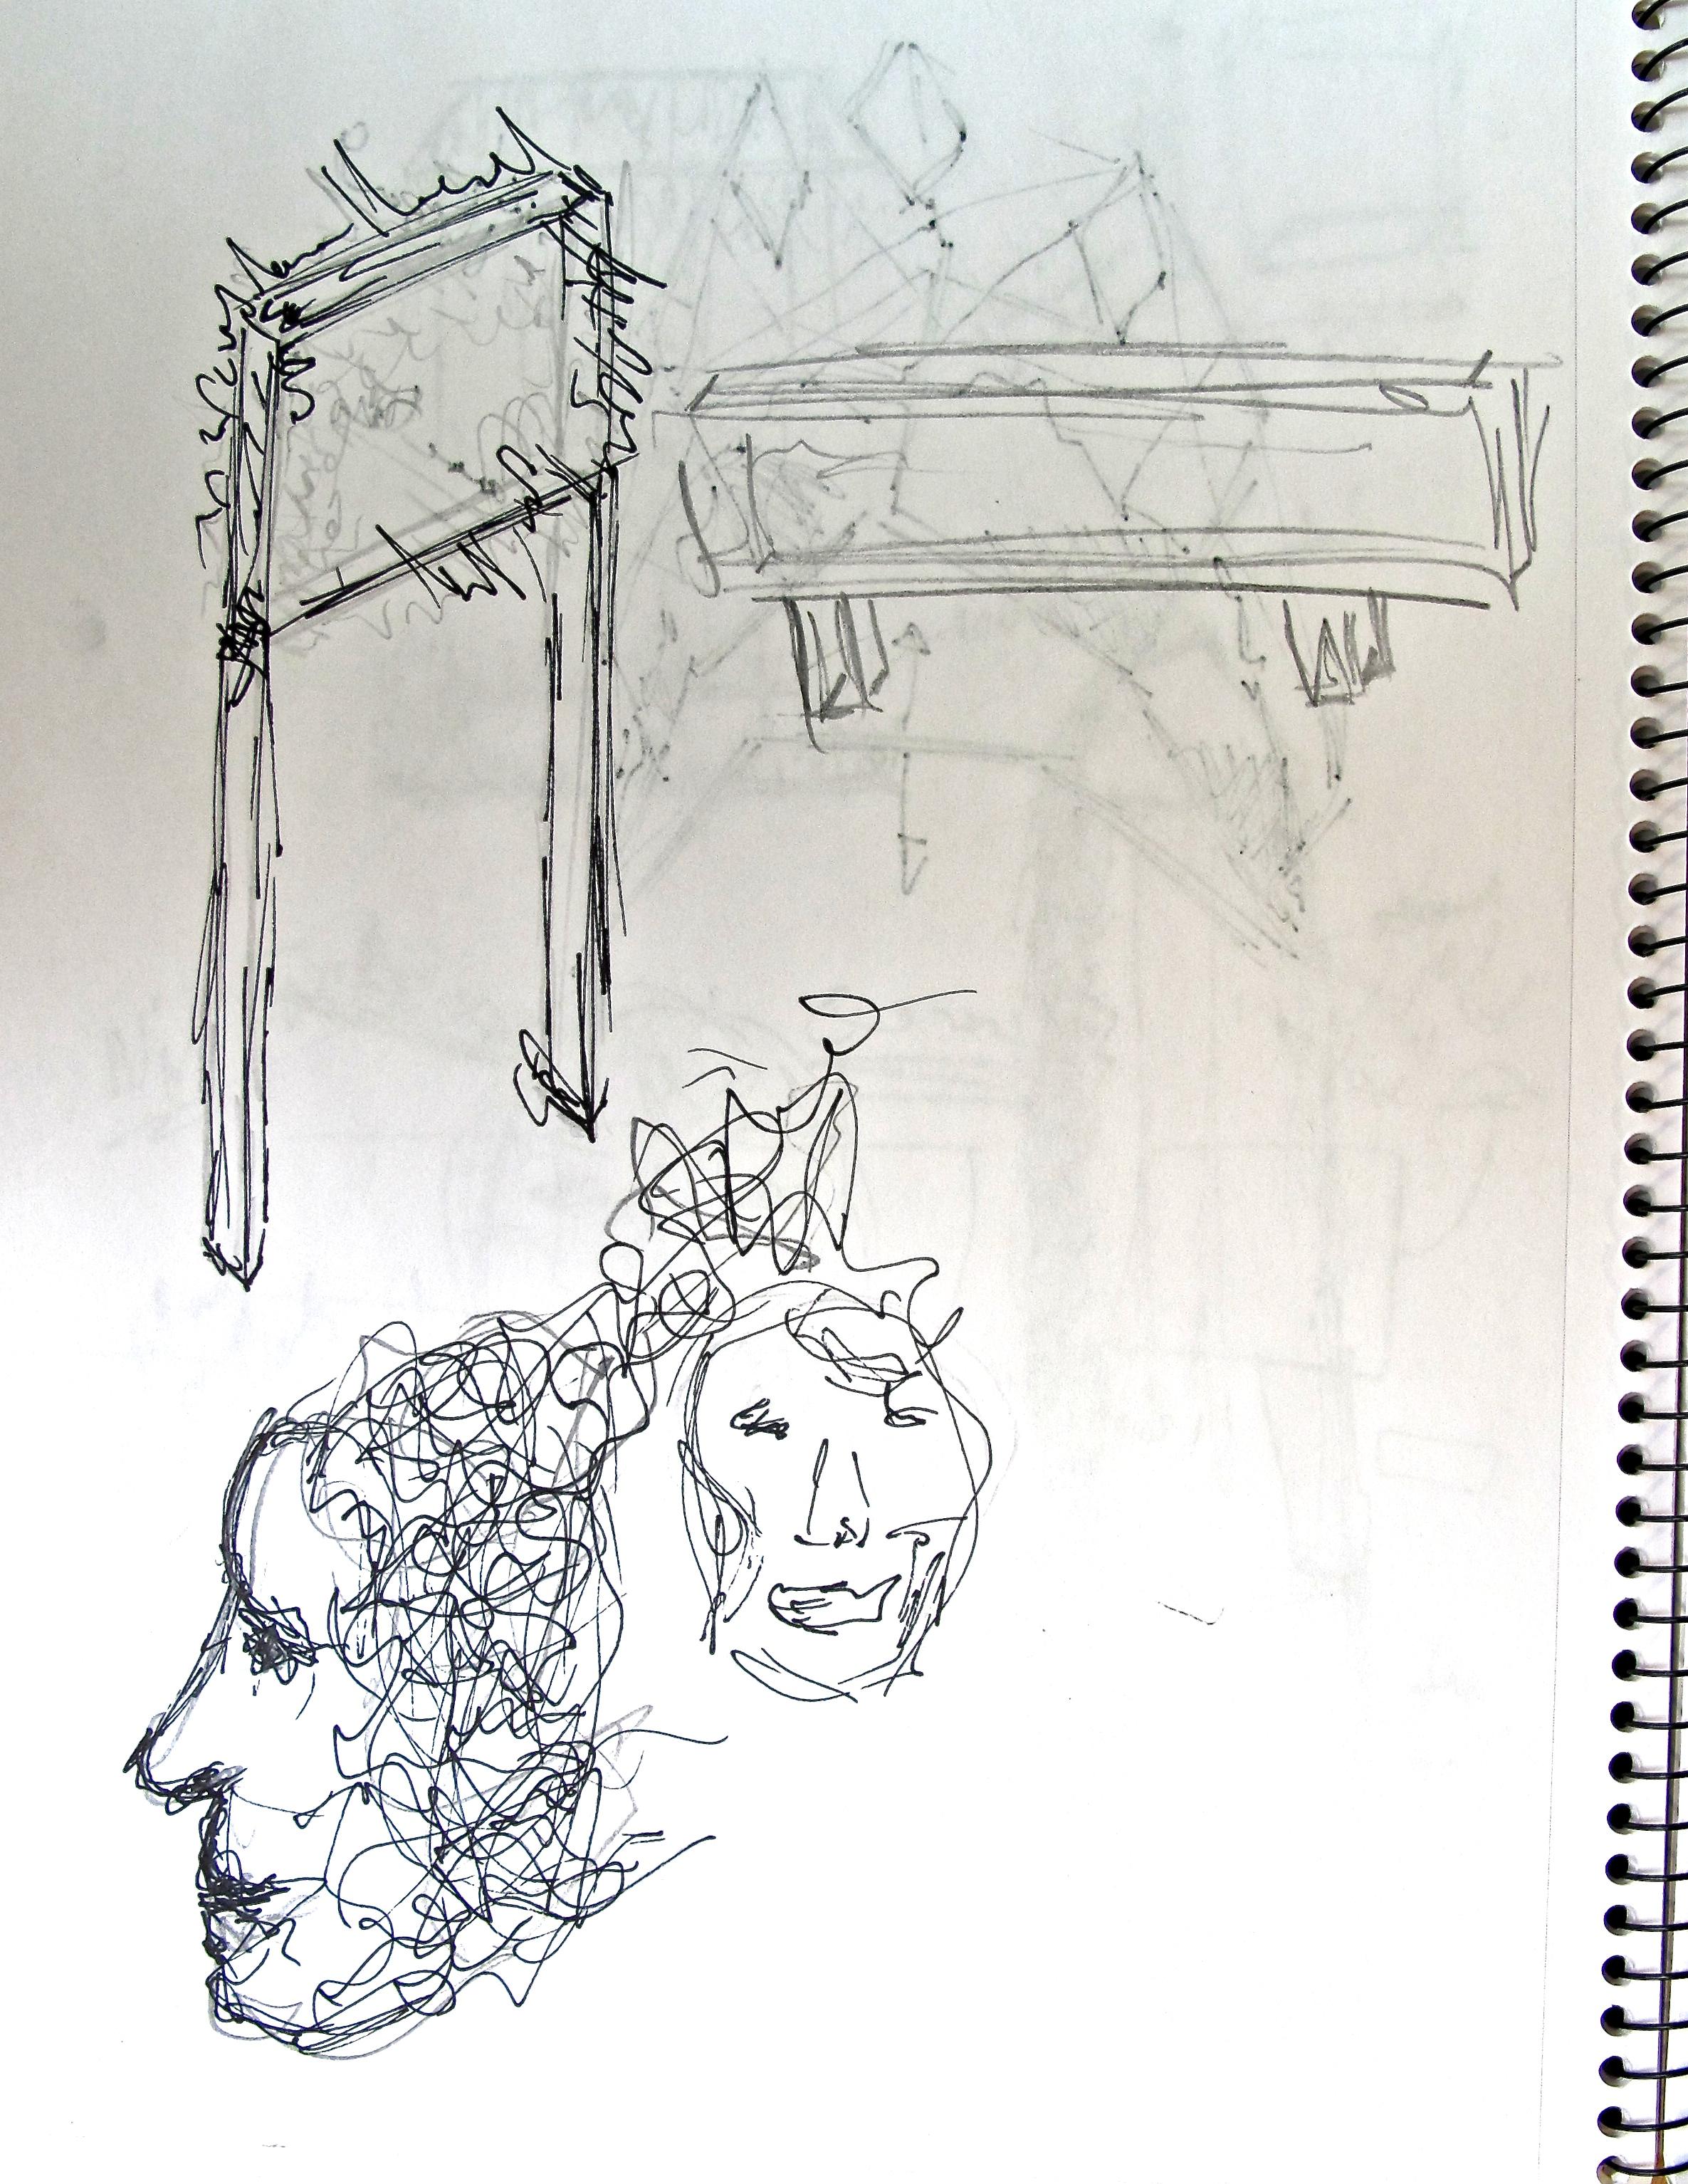 doni sketch.jpg